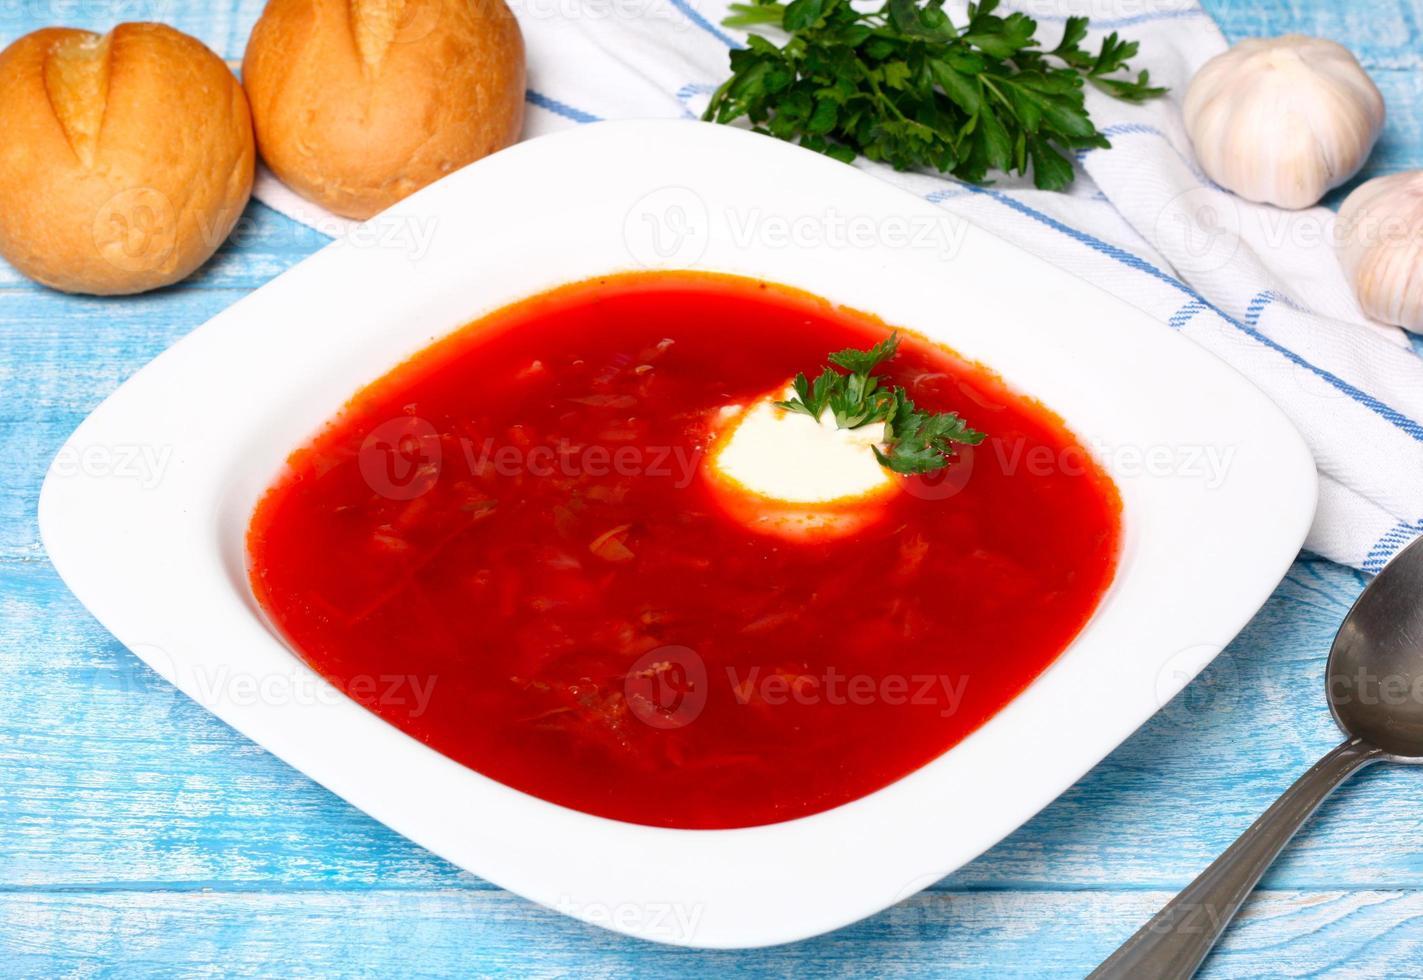 traditionele Russische en Oekraïense borschtsoep foto